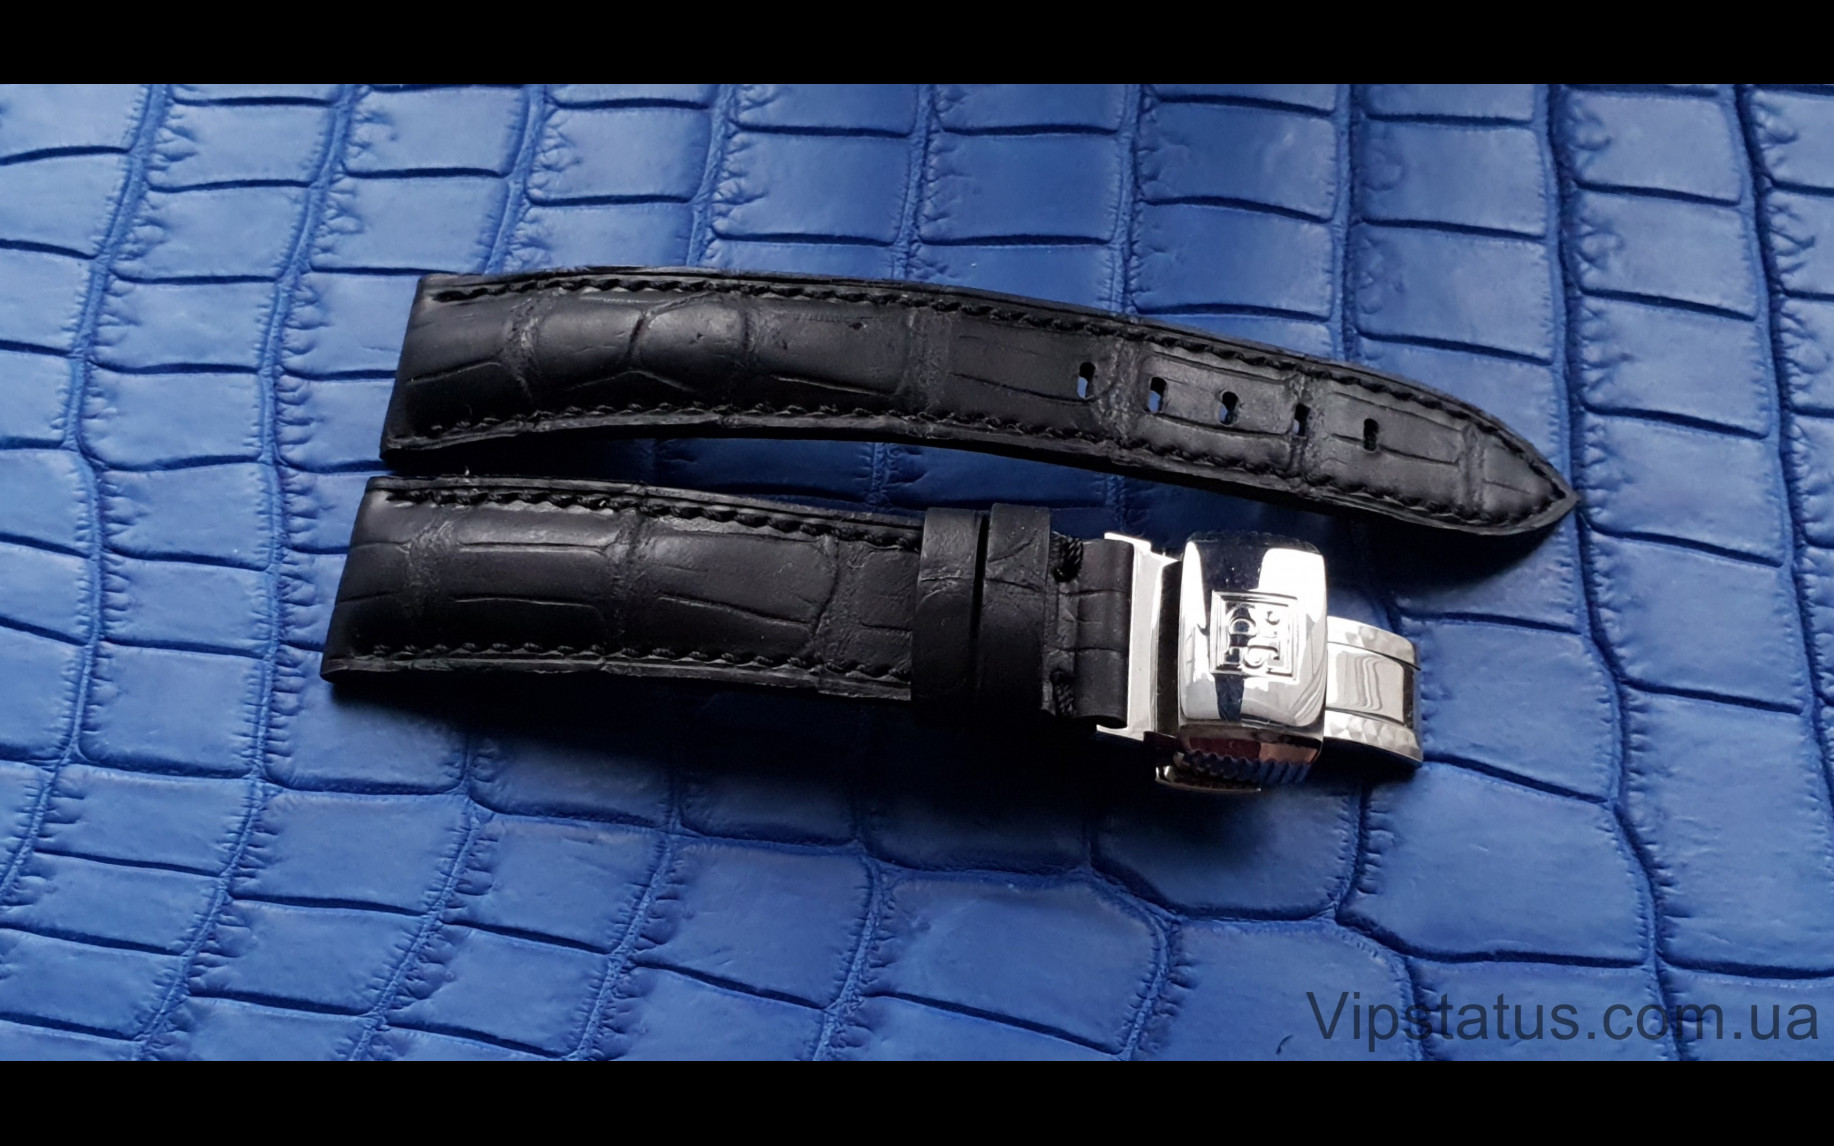 Elite Эксклюзивный ремешок для часов Perrelet кожа крокодила Exclusive Crocodile Strap for Perrelet watches image 2